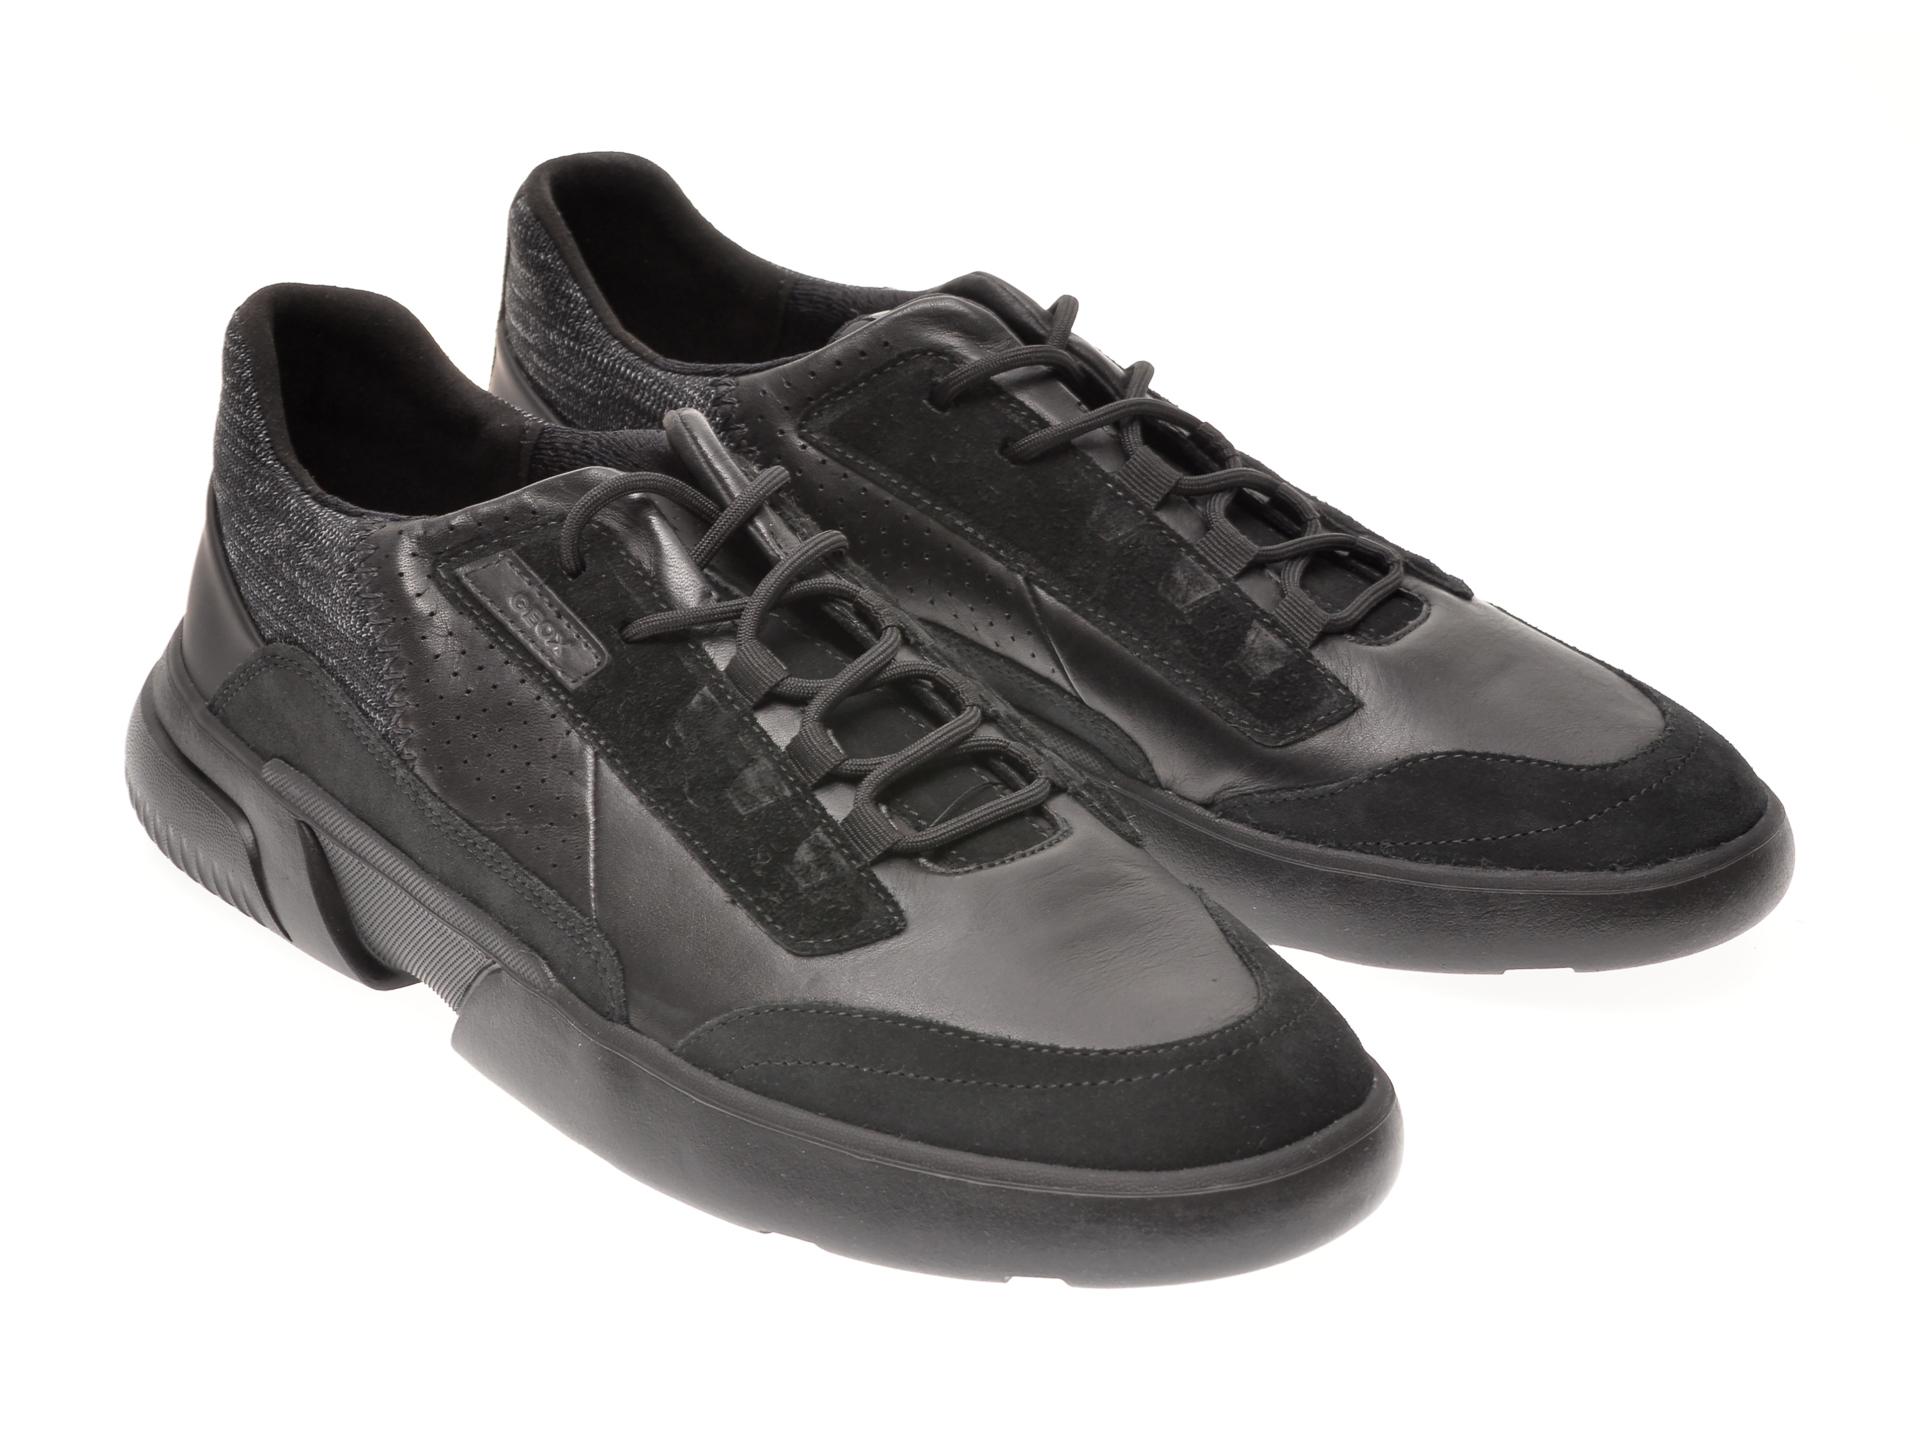 Pantofi GEOX negri, U04AFA, din piele naturala imagine